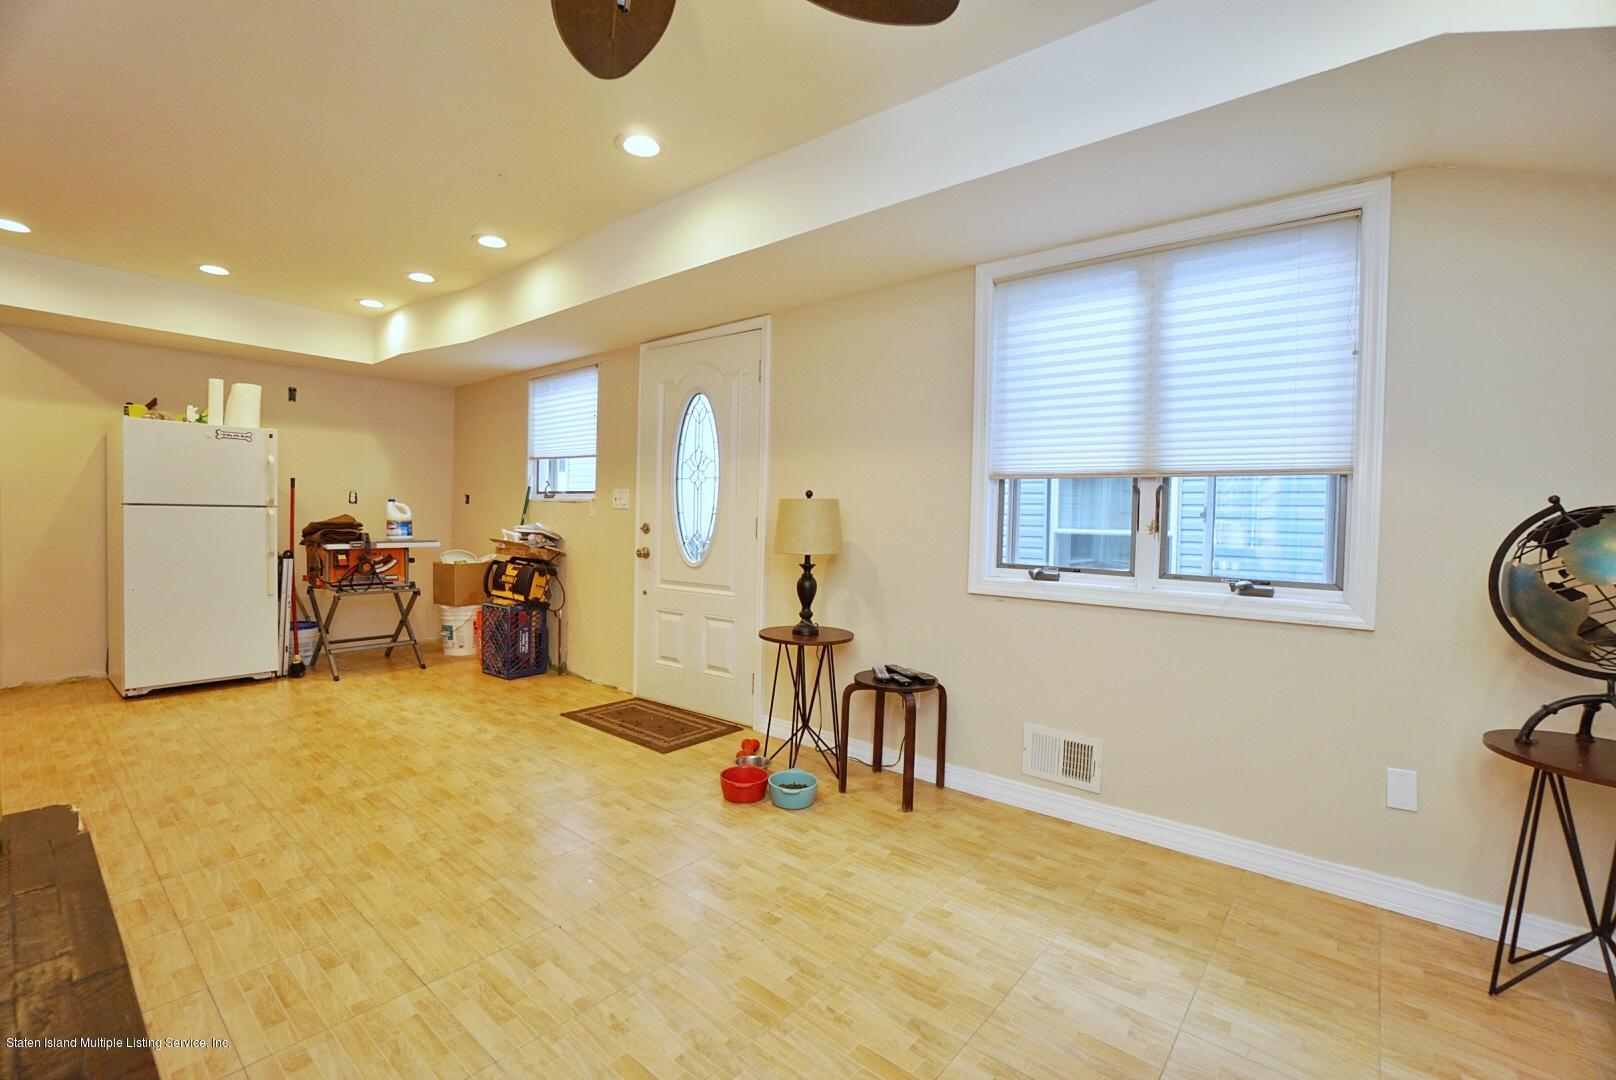 Single Family - Semi-Attached 47 Ilyse Court   Staten Island, NY 10306, MLS-1141335-26